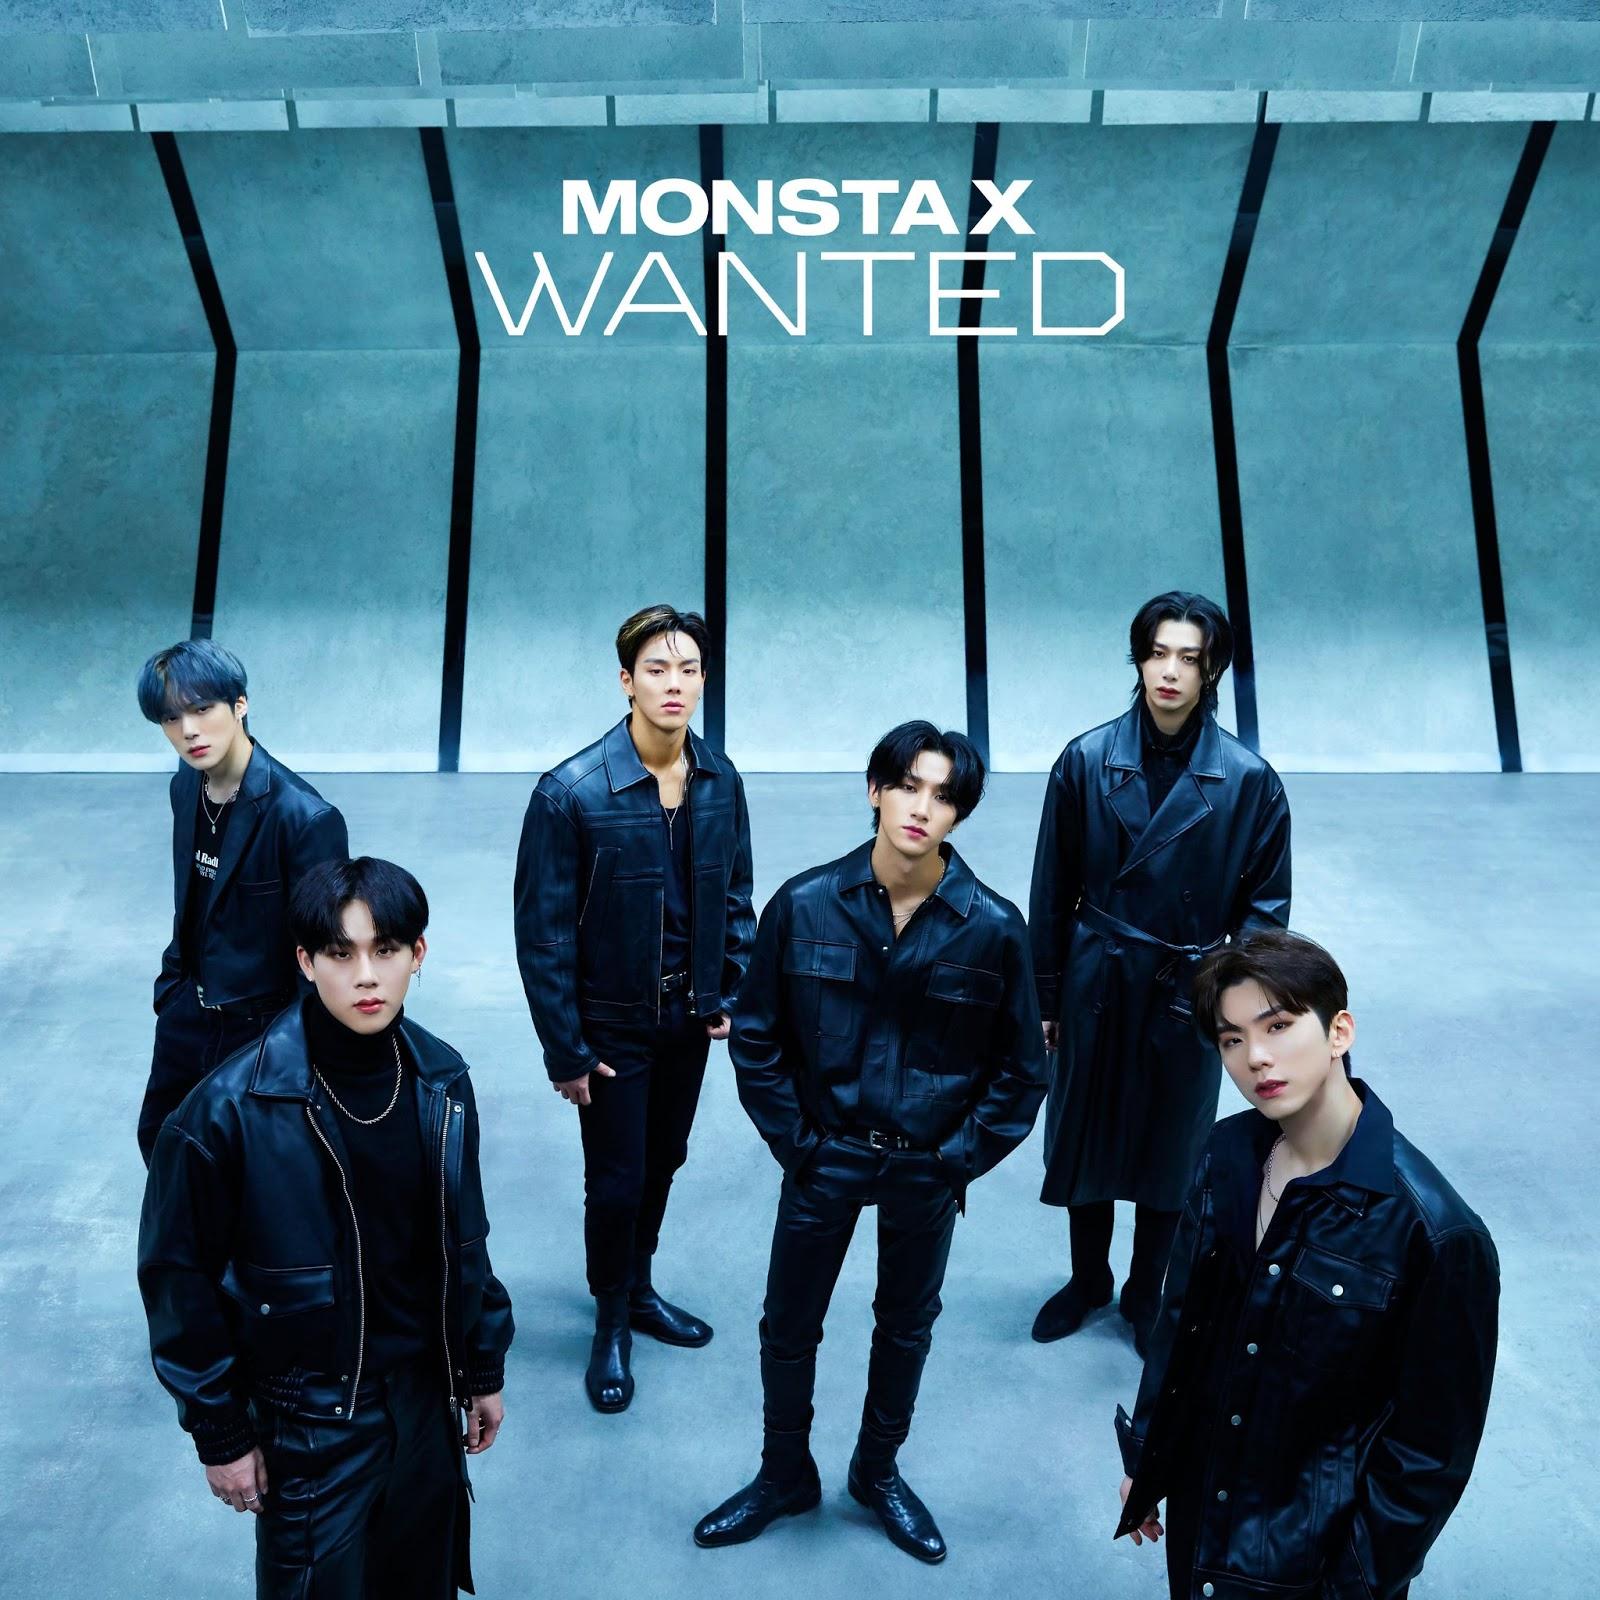 monsta x wanted single japon